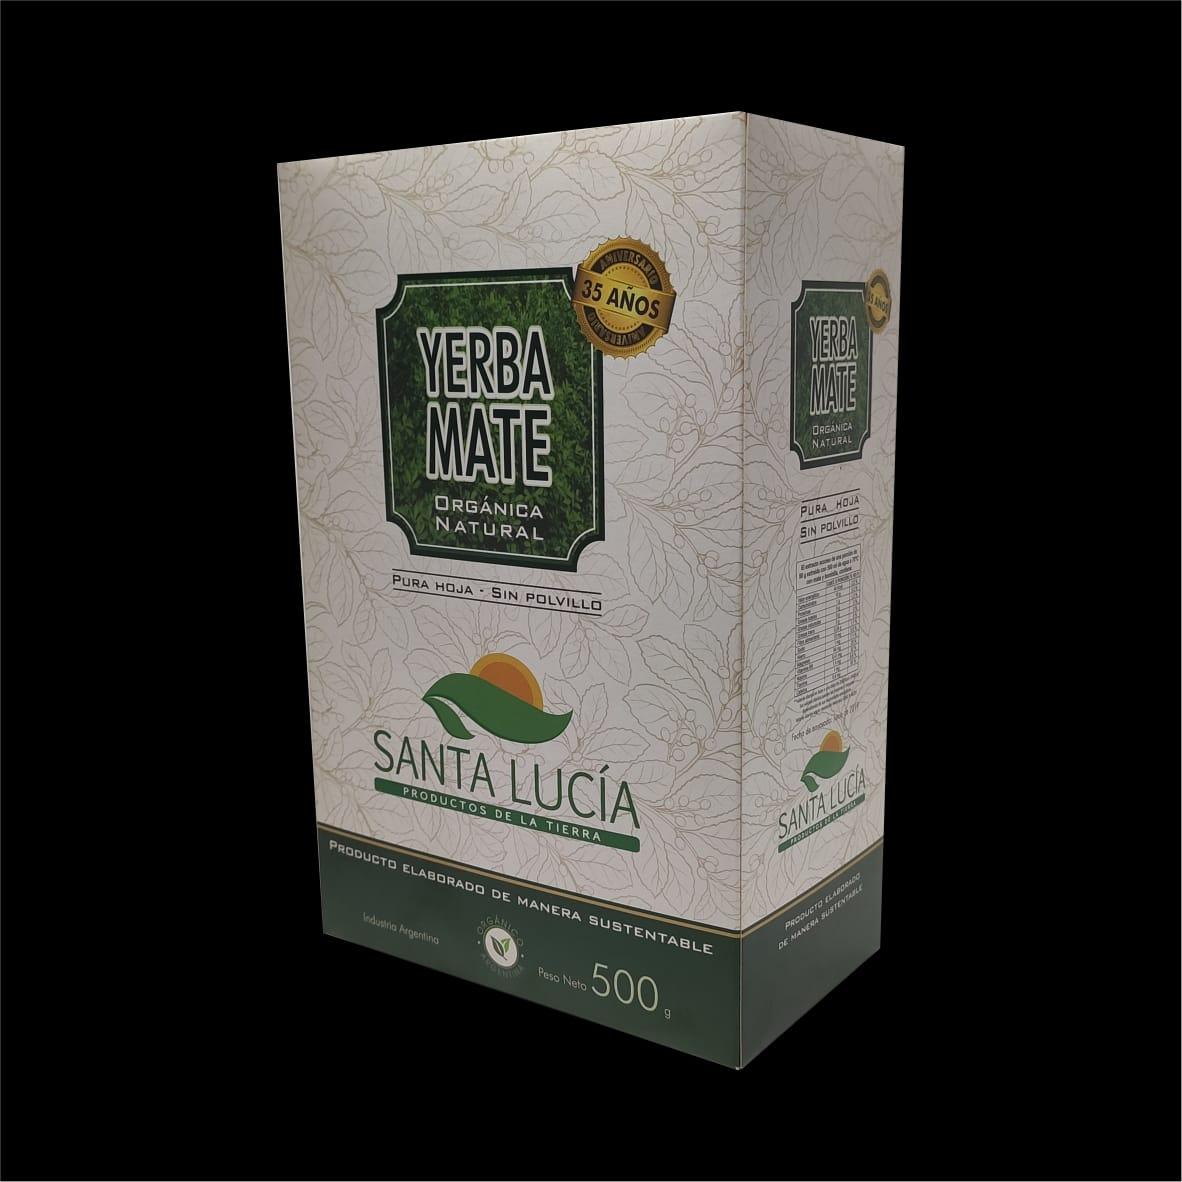 Packaging  Yerba Mate Santa Lucia